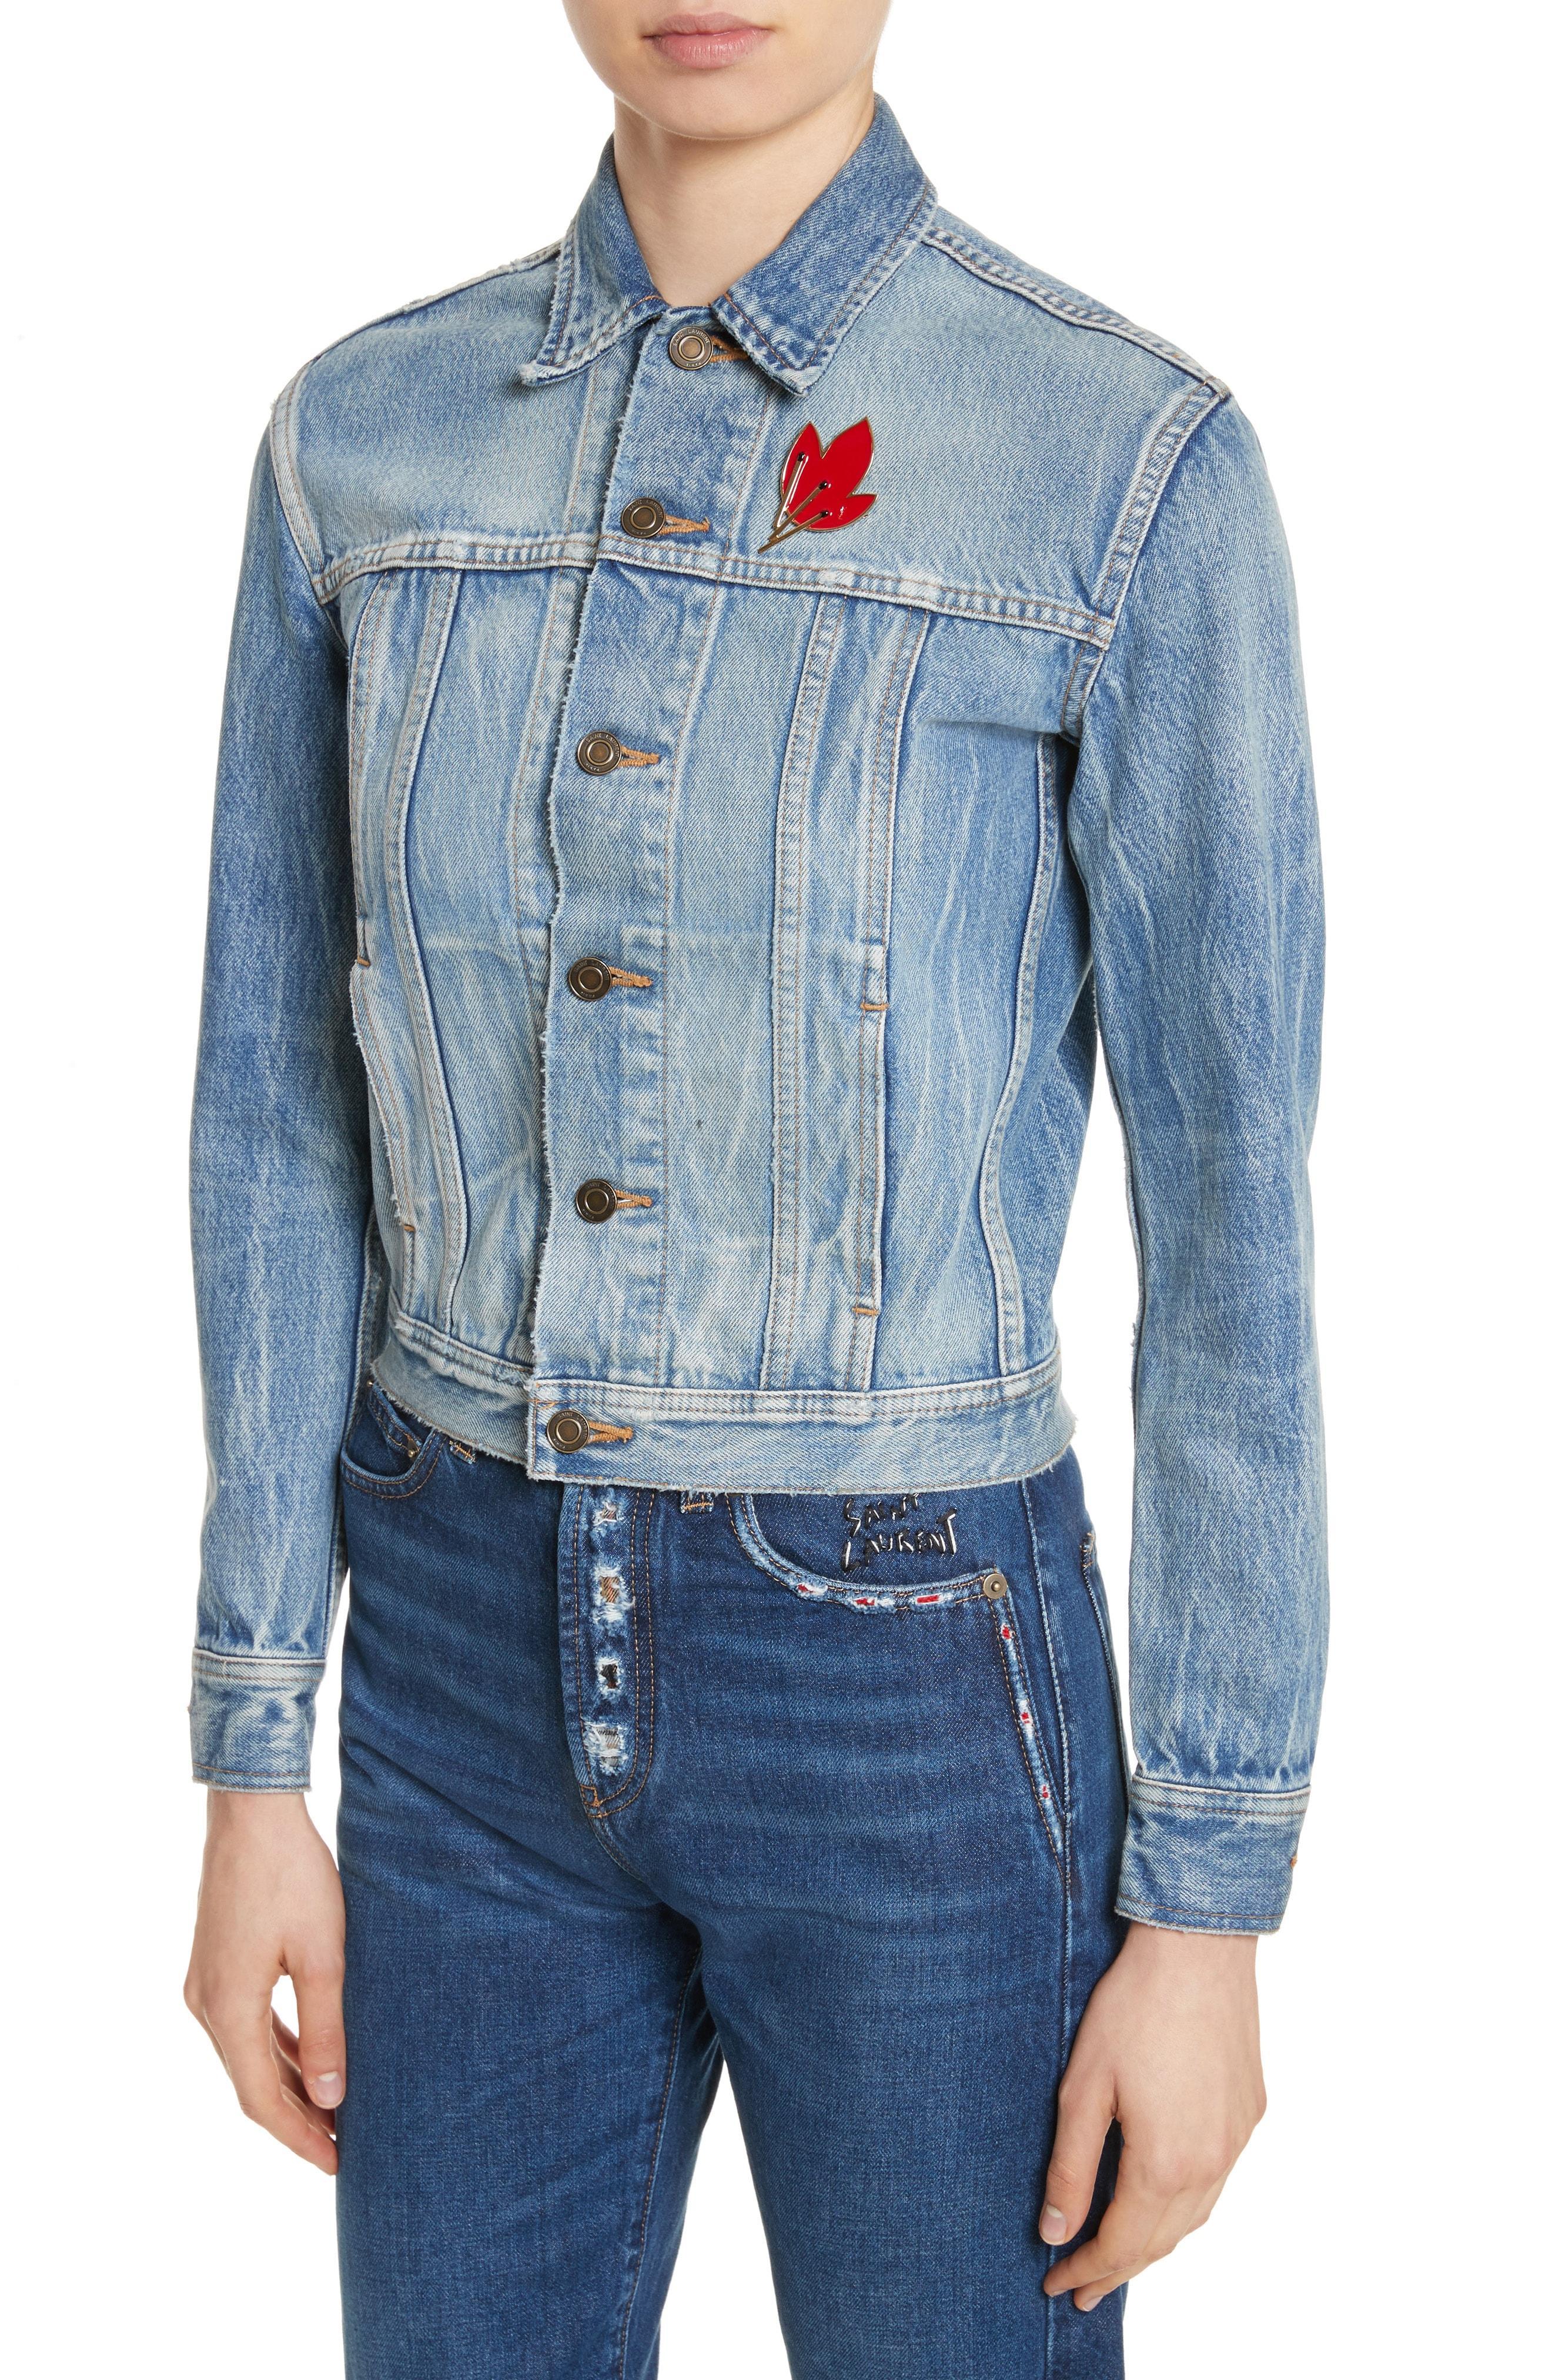 95d9262540 SAINT LAURENT. Original Ysl Military Patch Jean Jacket In Washed Blue ...